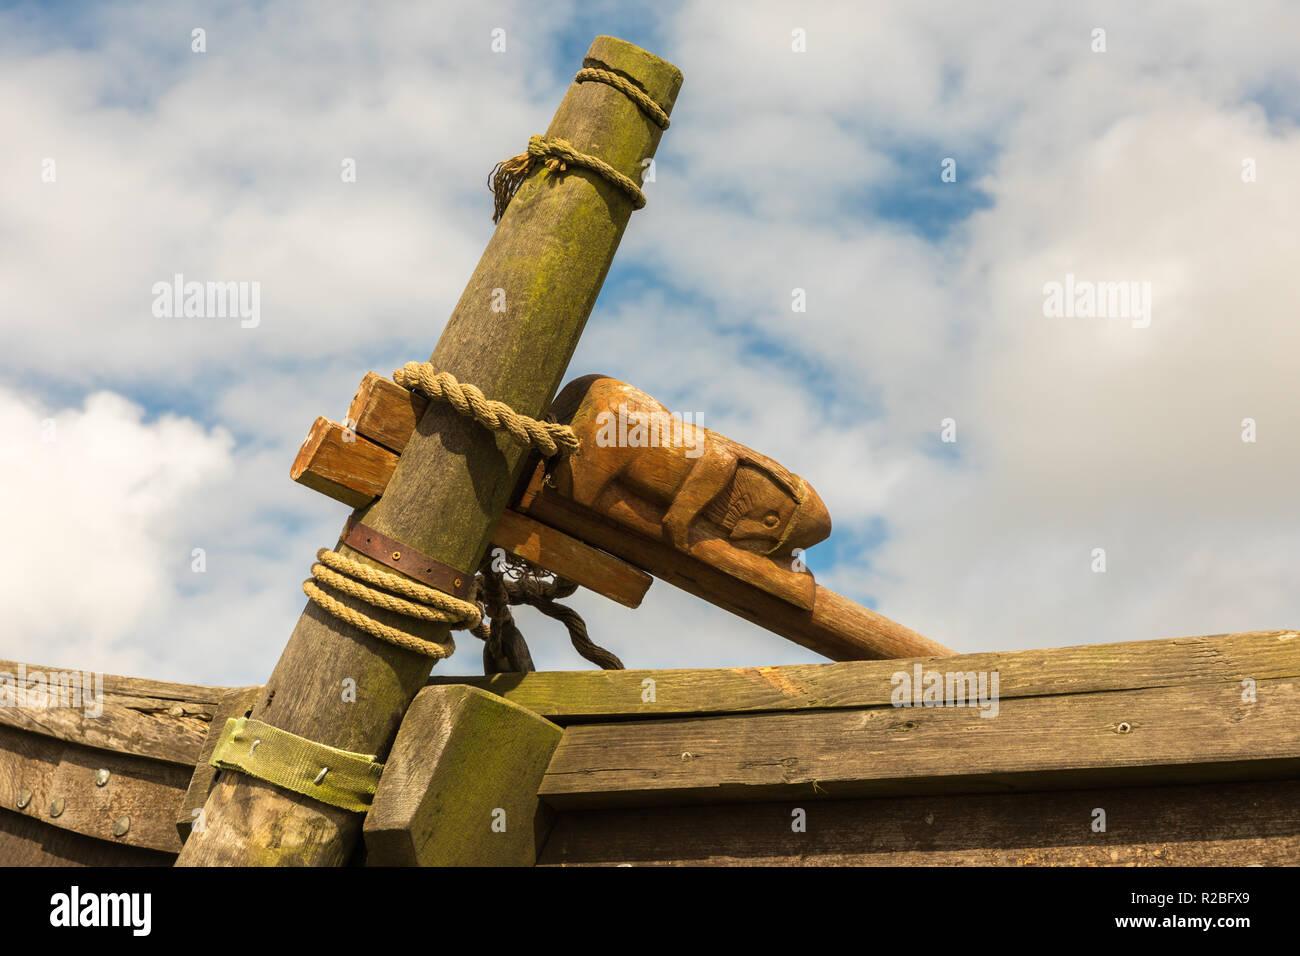 Gokstad Viking longship, replica, Haroldswick, Shetalnd - Stock Image